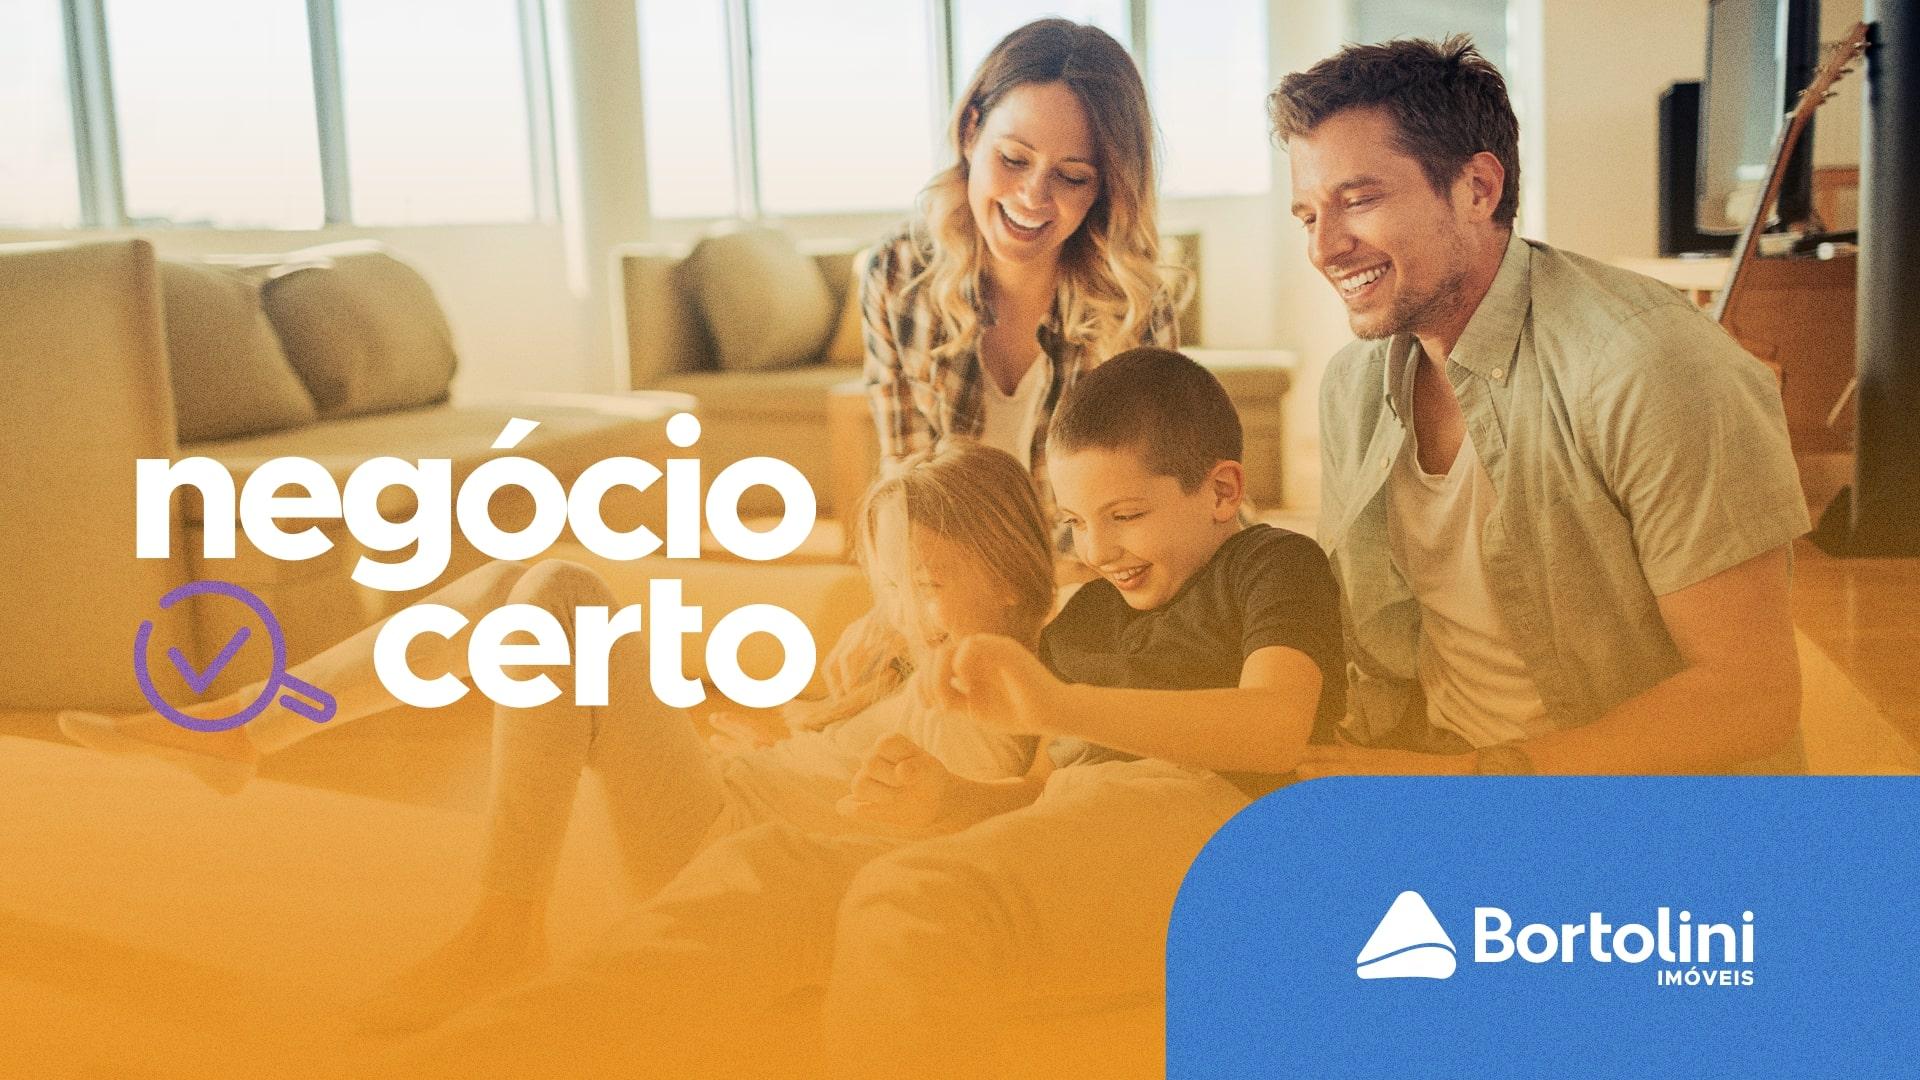 Bortolini Imóveis lança campanha Negócio Certo